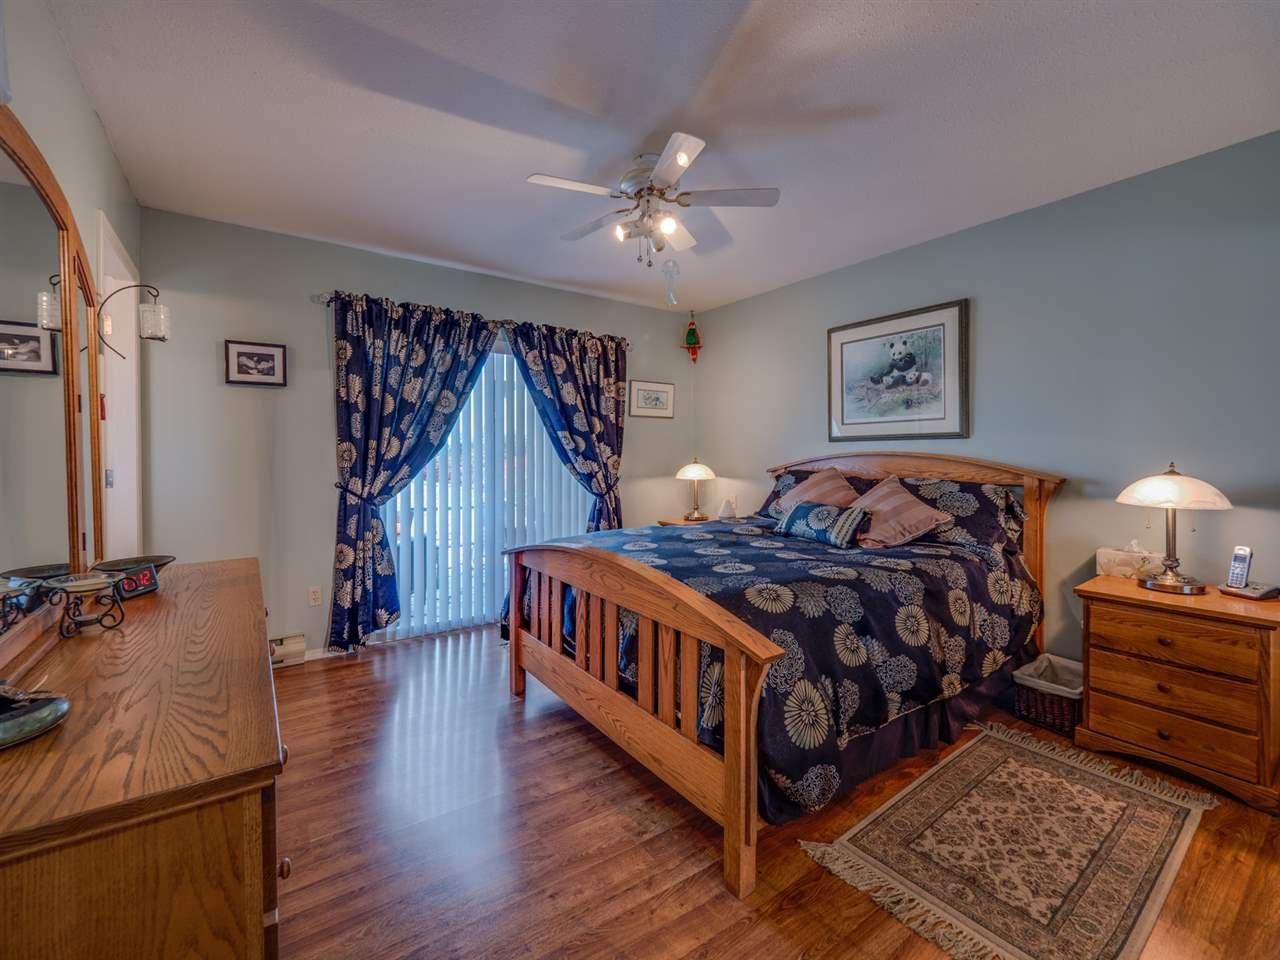 Photo 7: Photos: 4983 ARBUTUS Road in Sechelt: Sechelt District House for sale (Sunshine Coast)  : MLS®# R2427502